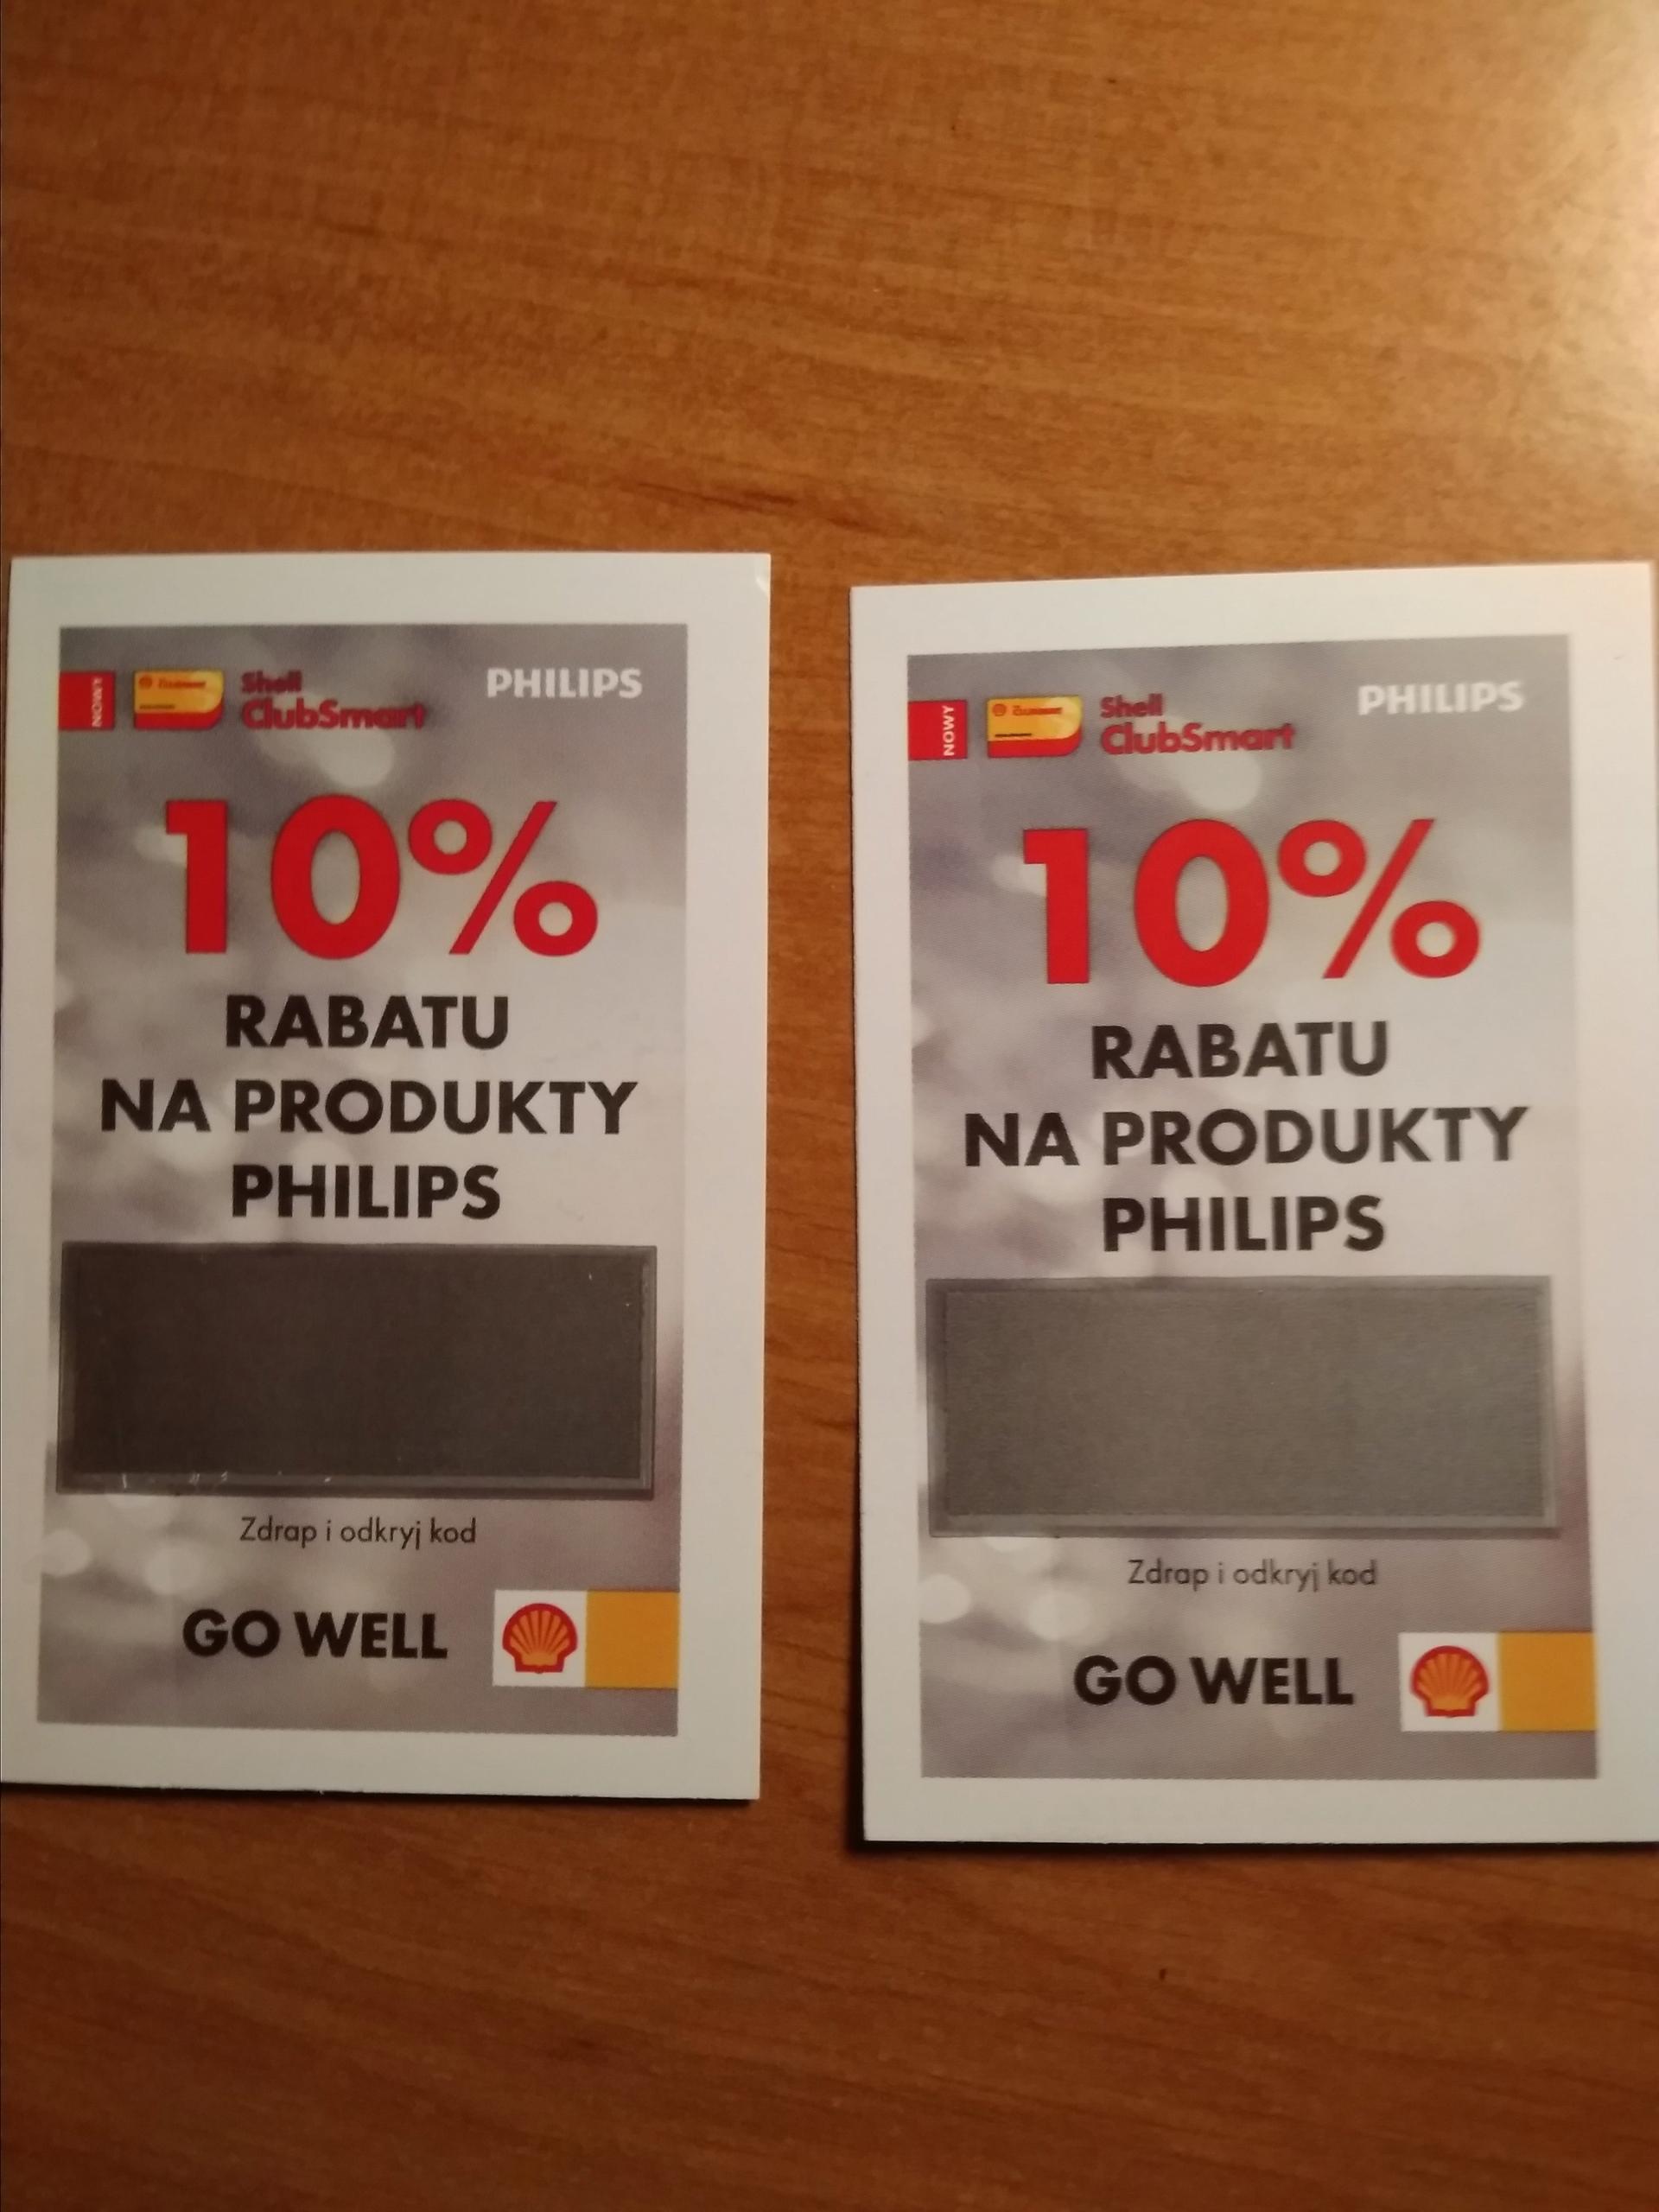 Shell philips kupon 20 procent